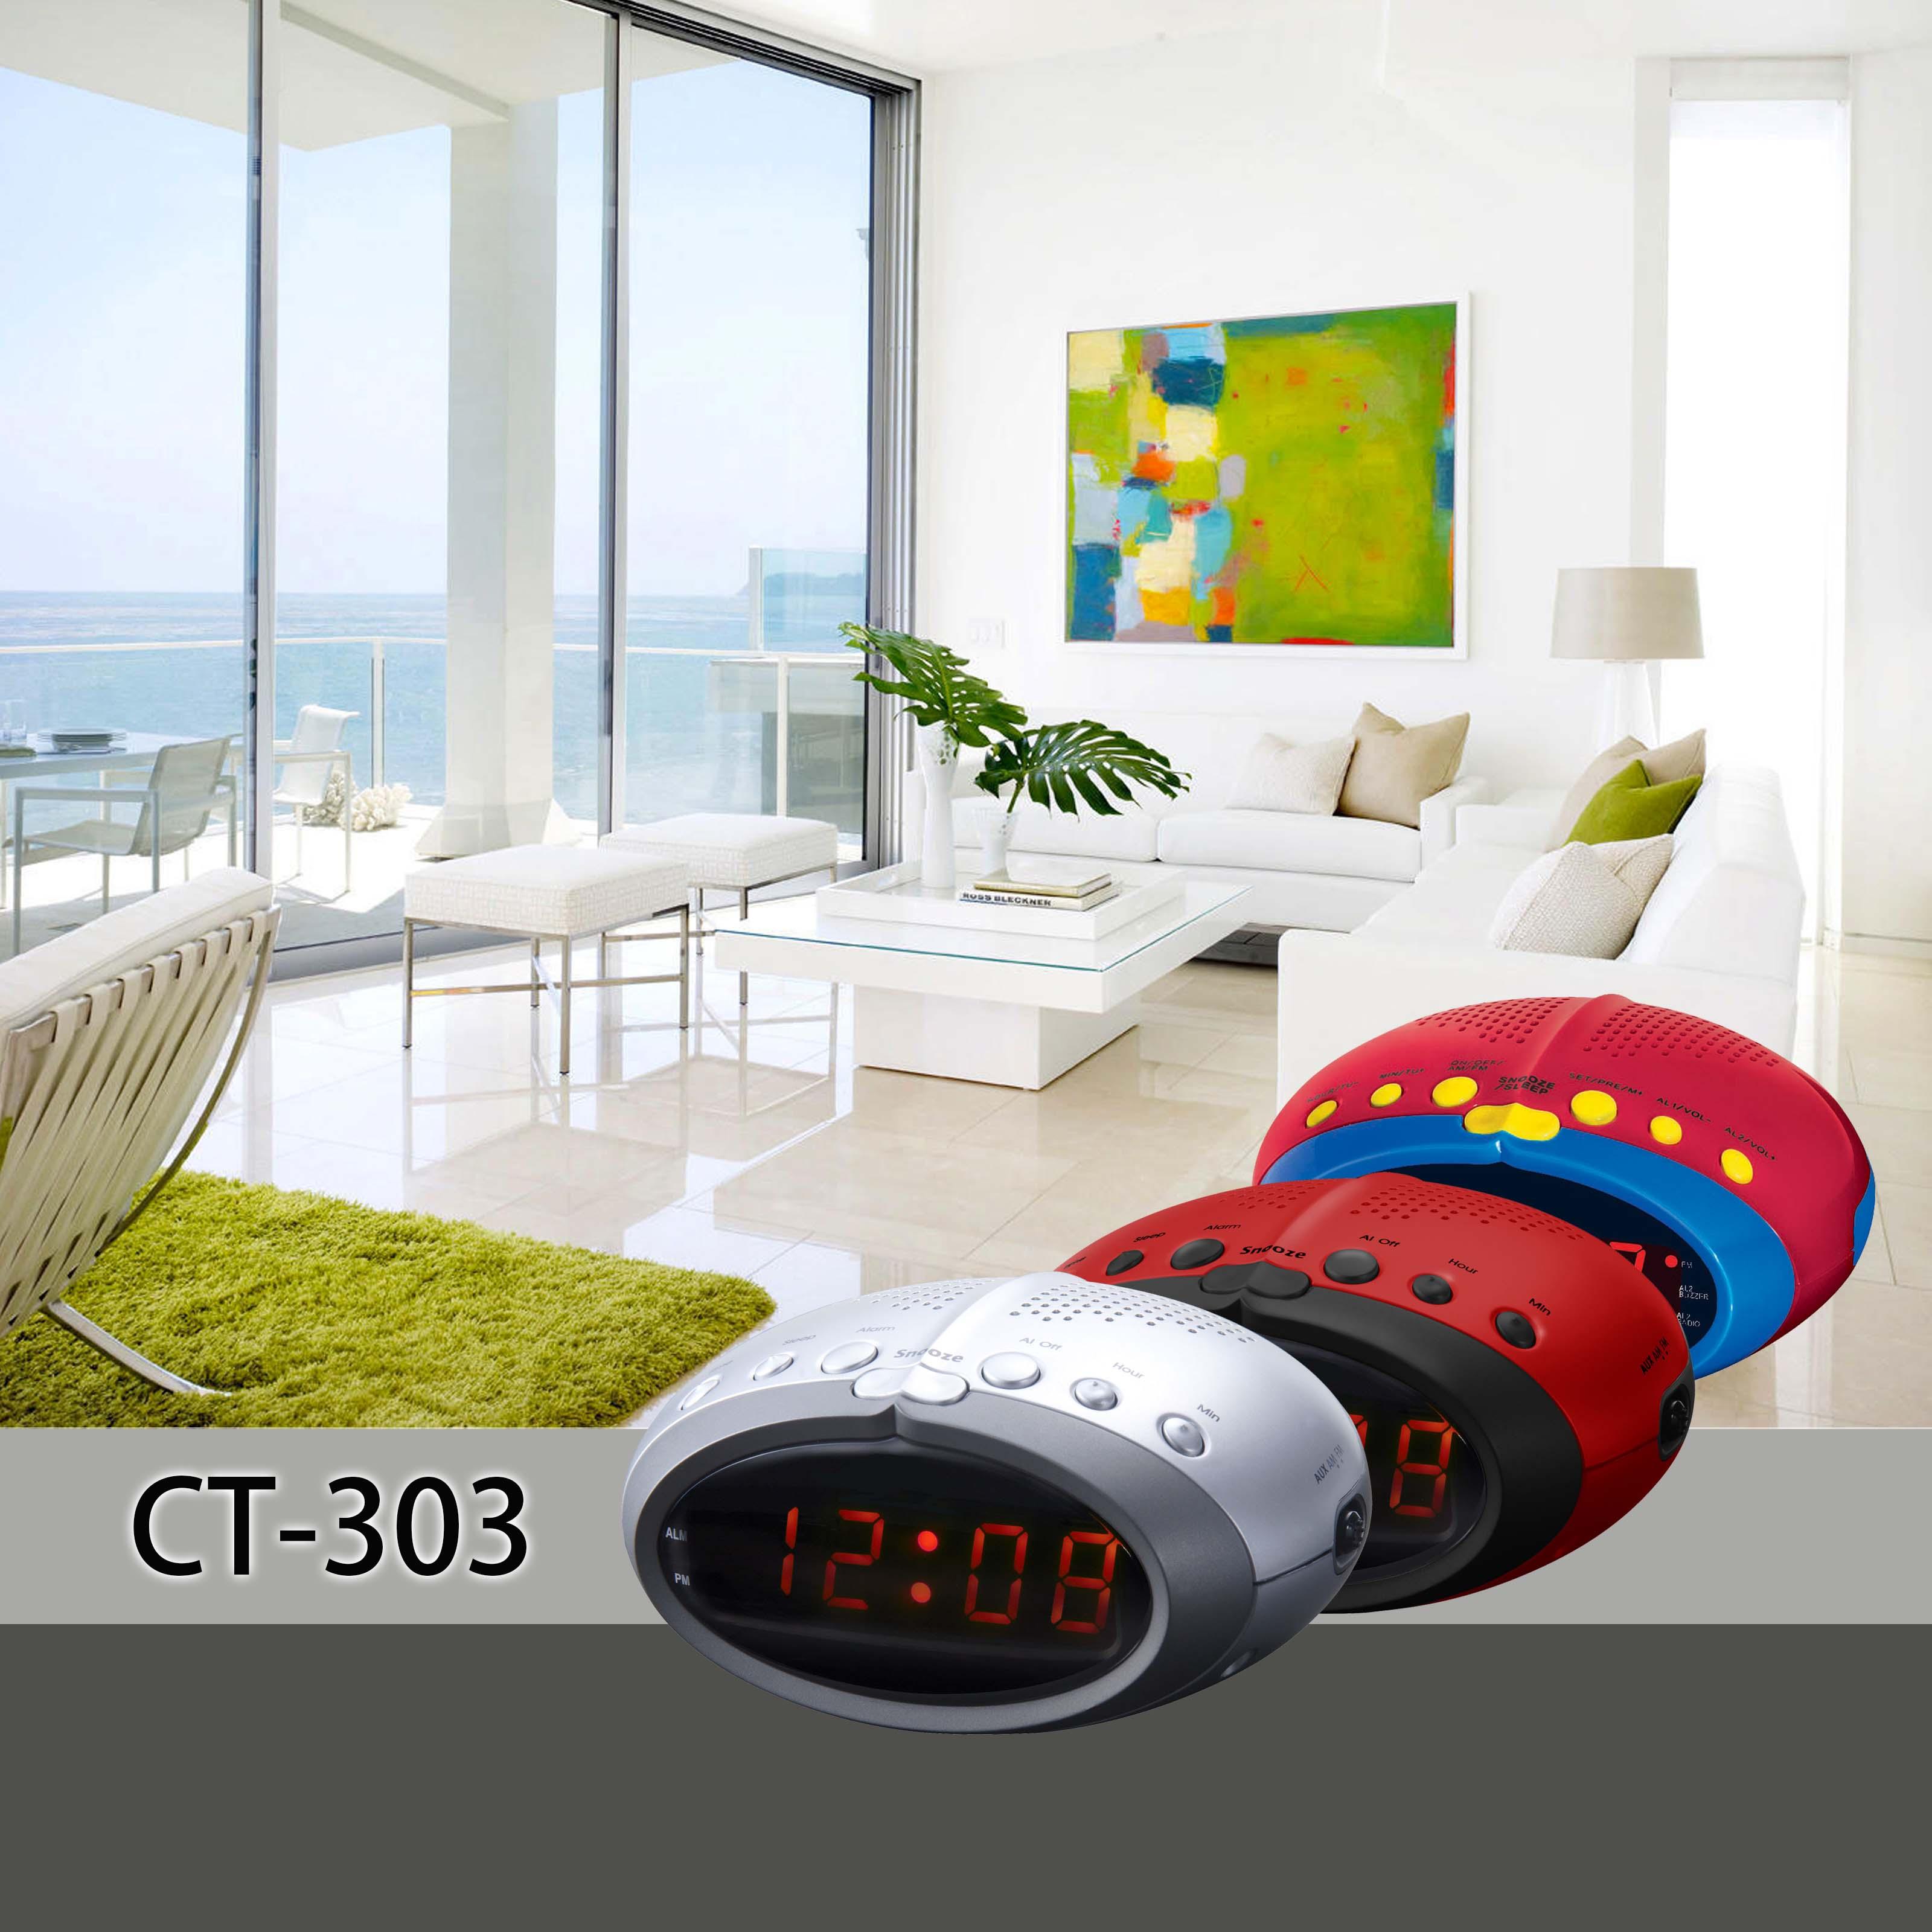 CT-303 Livingroom.jpg